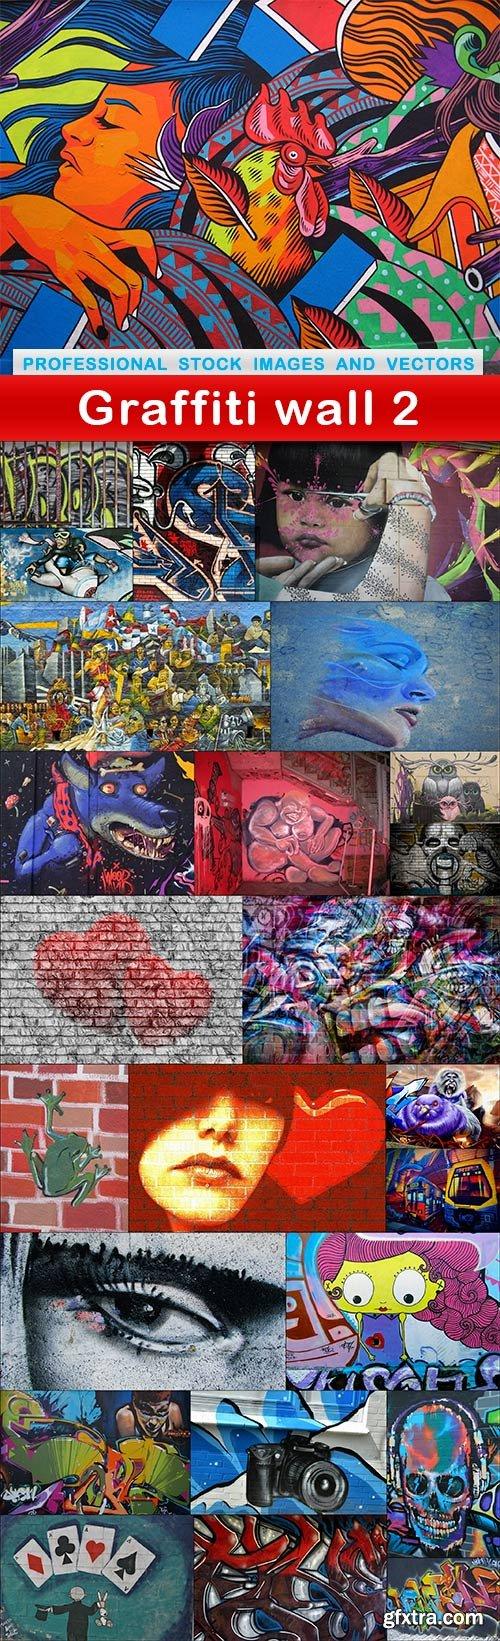 Graffiti wall 2 - 25 UHQ JPEG